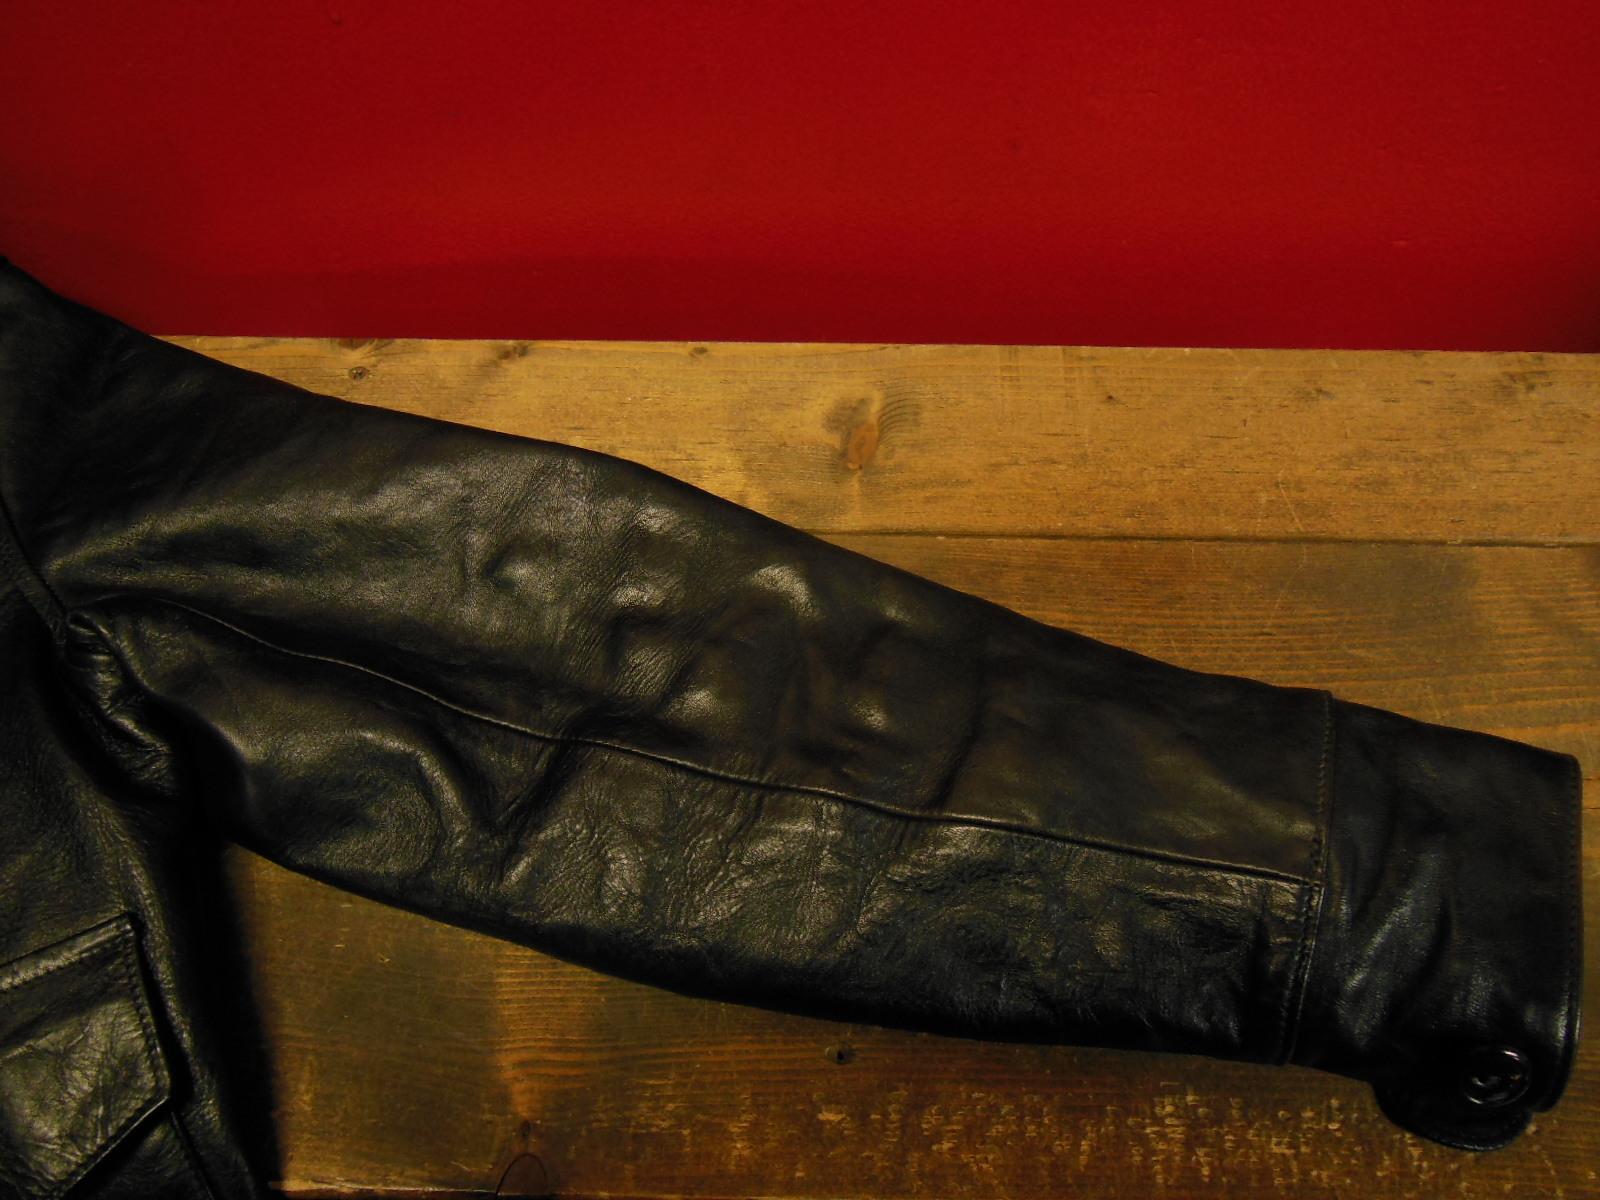 USED HIMEL BROTHERS LEATHER HERON 1929/新喜皮革製黒ホースハイド/SIZE-36/ボタンフロント A-1 ジャケット_c0187684_15075738.jpg